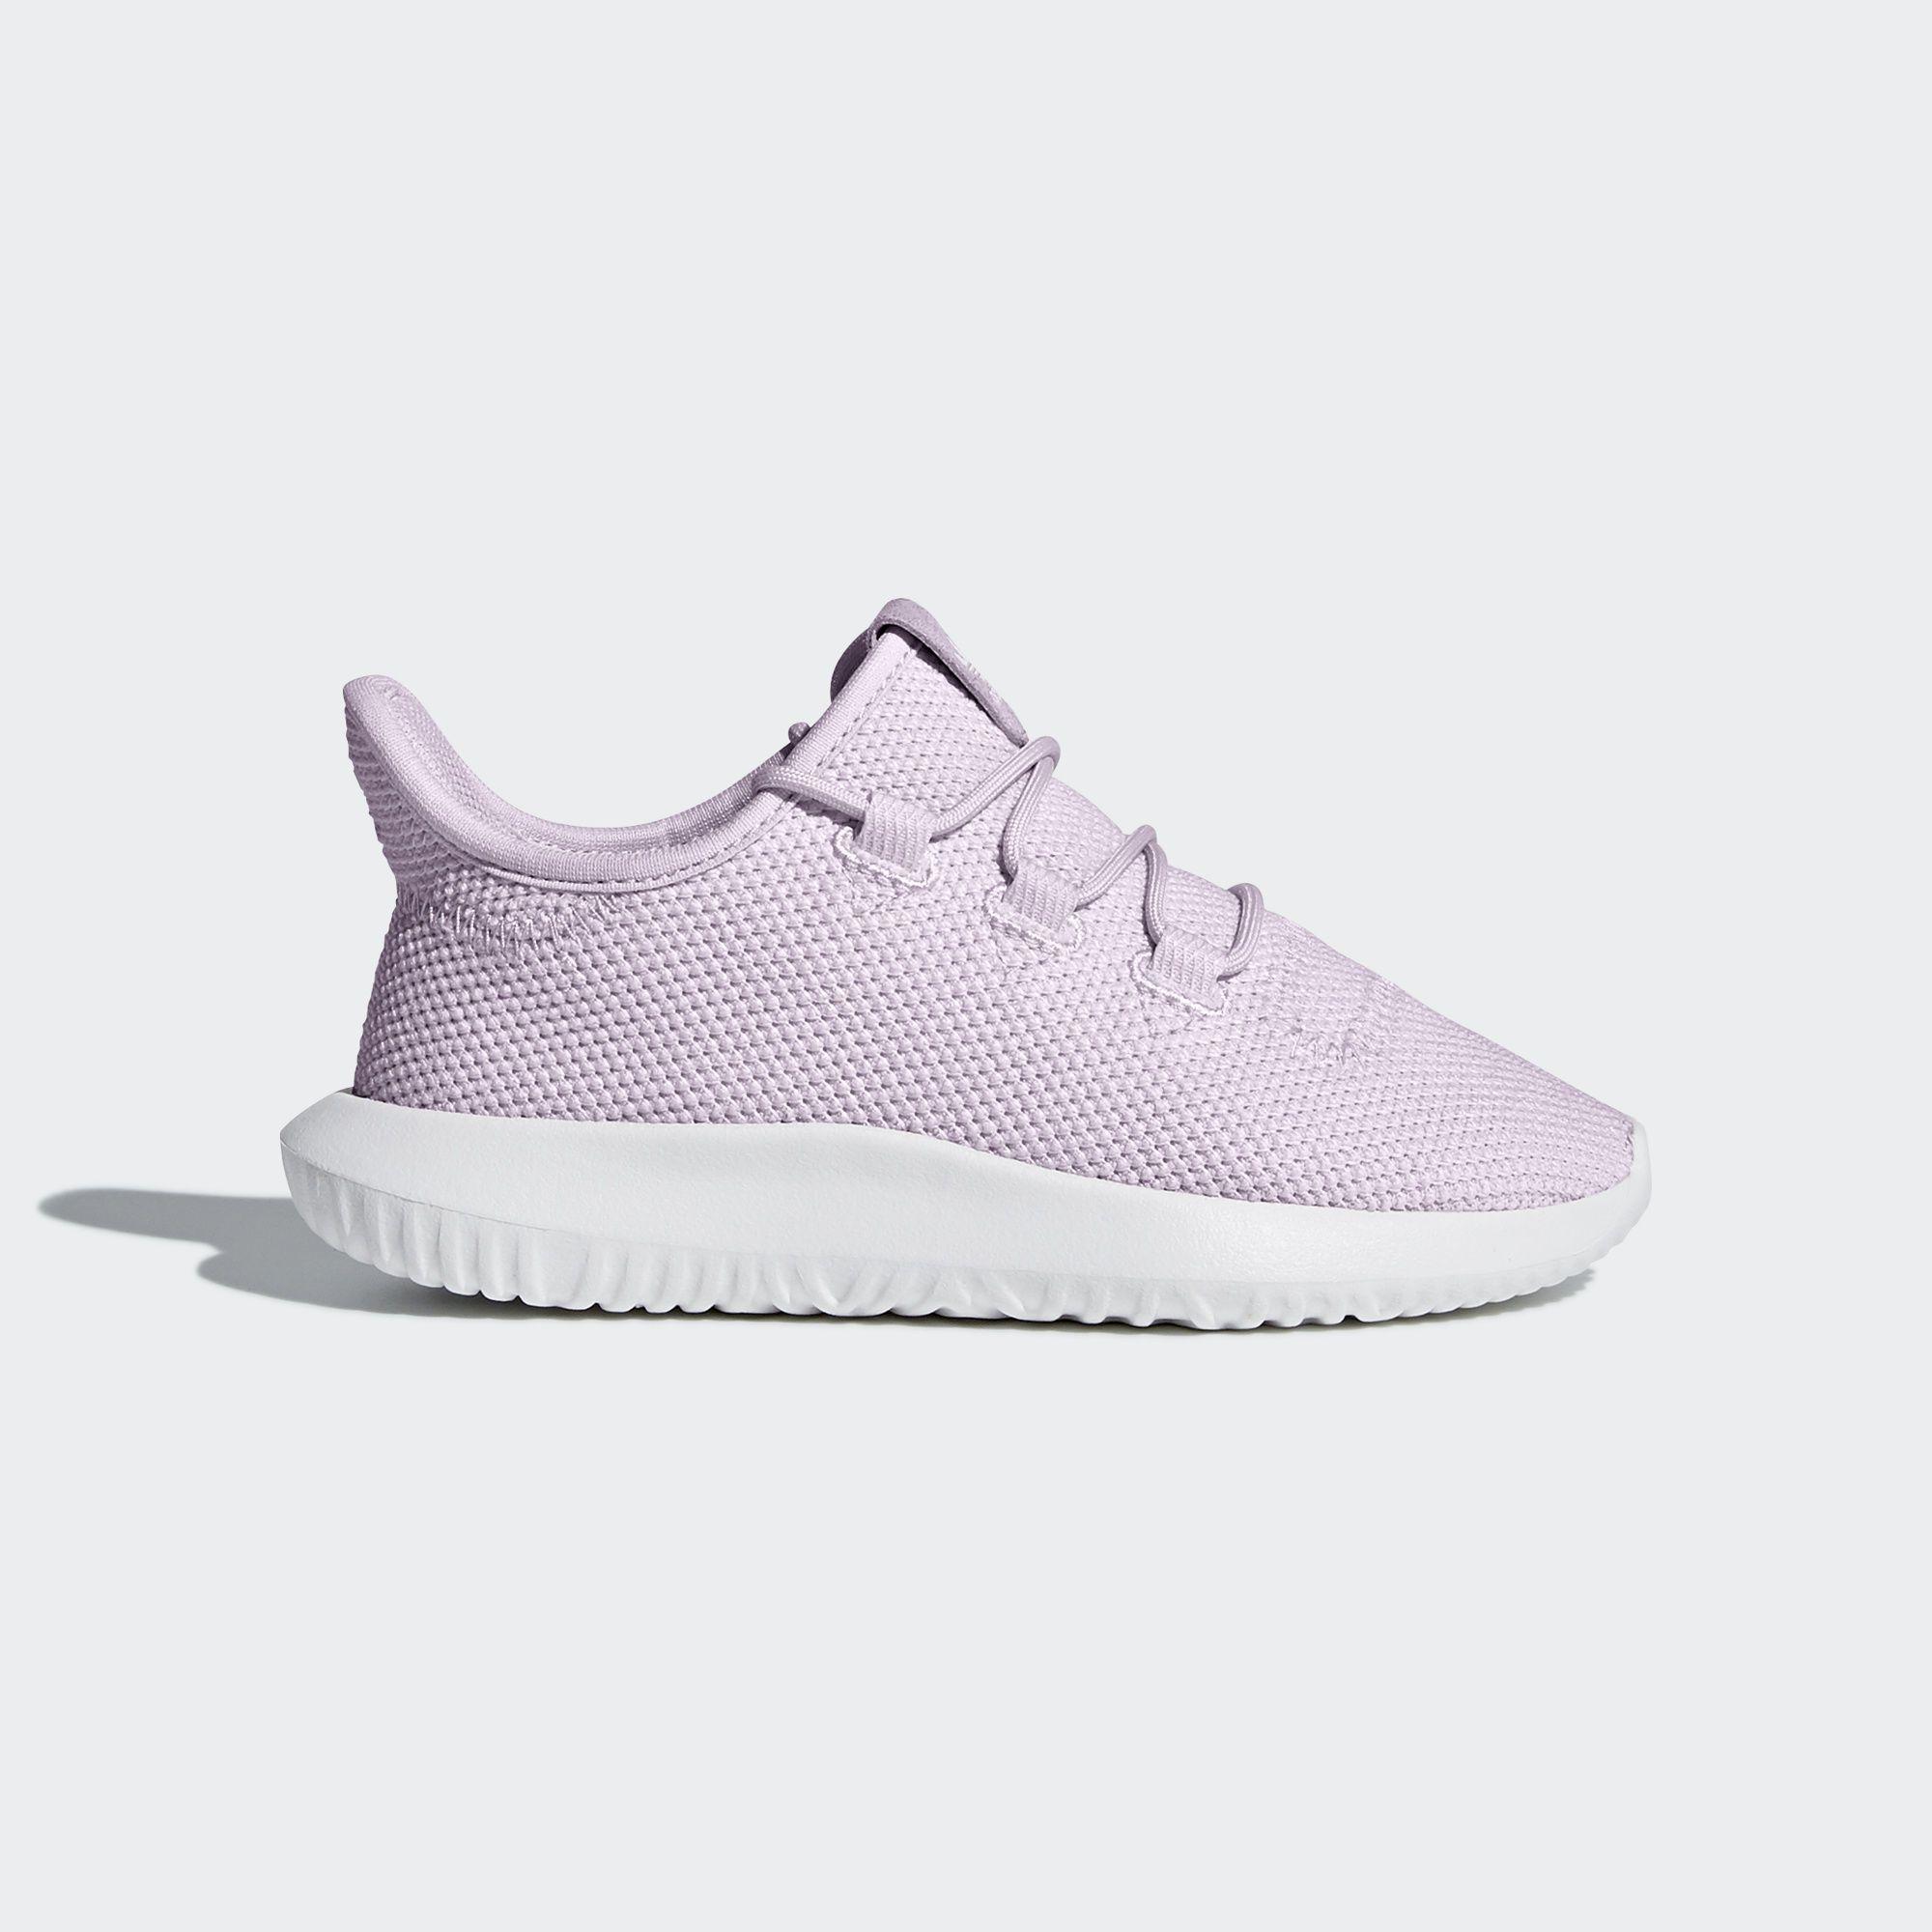 tubulare ombra scarpe rosa adidas, adidas e shopping